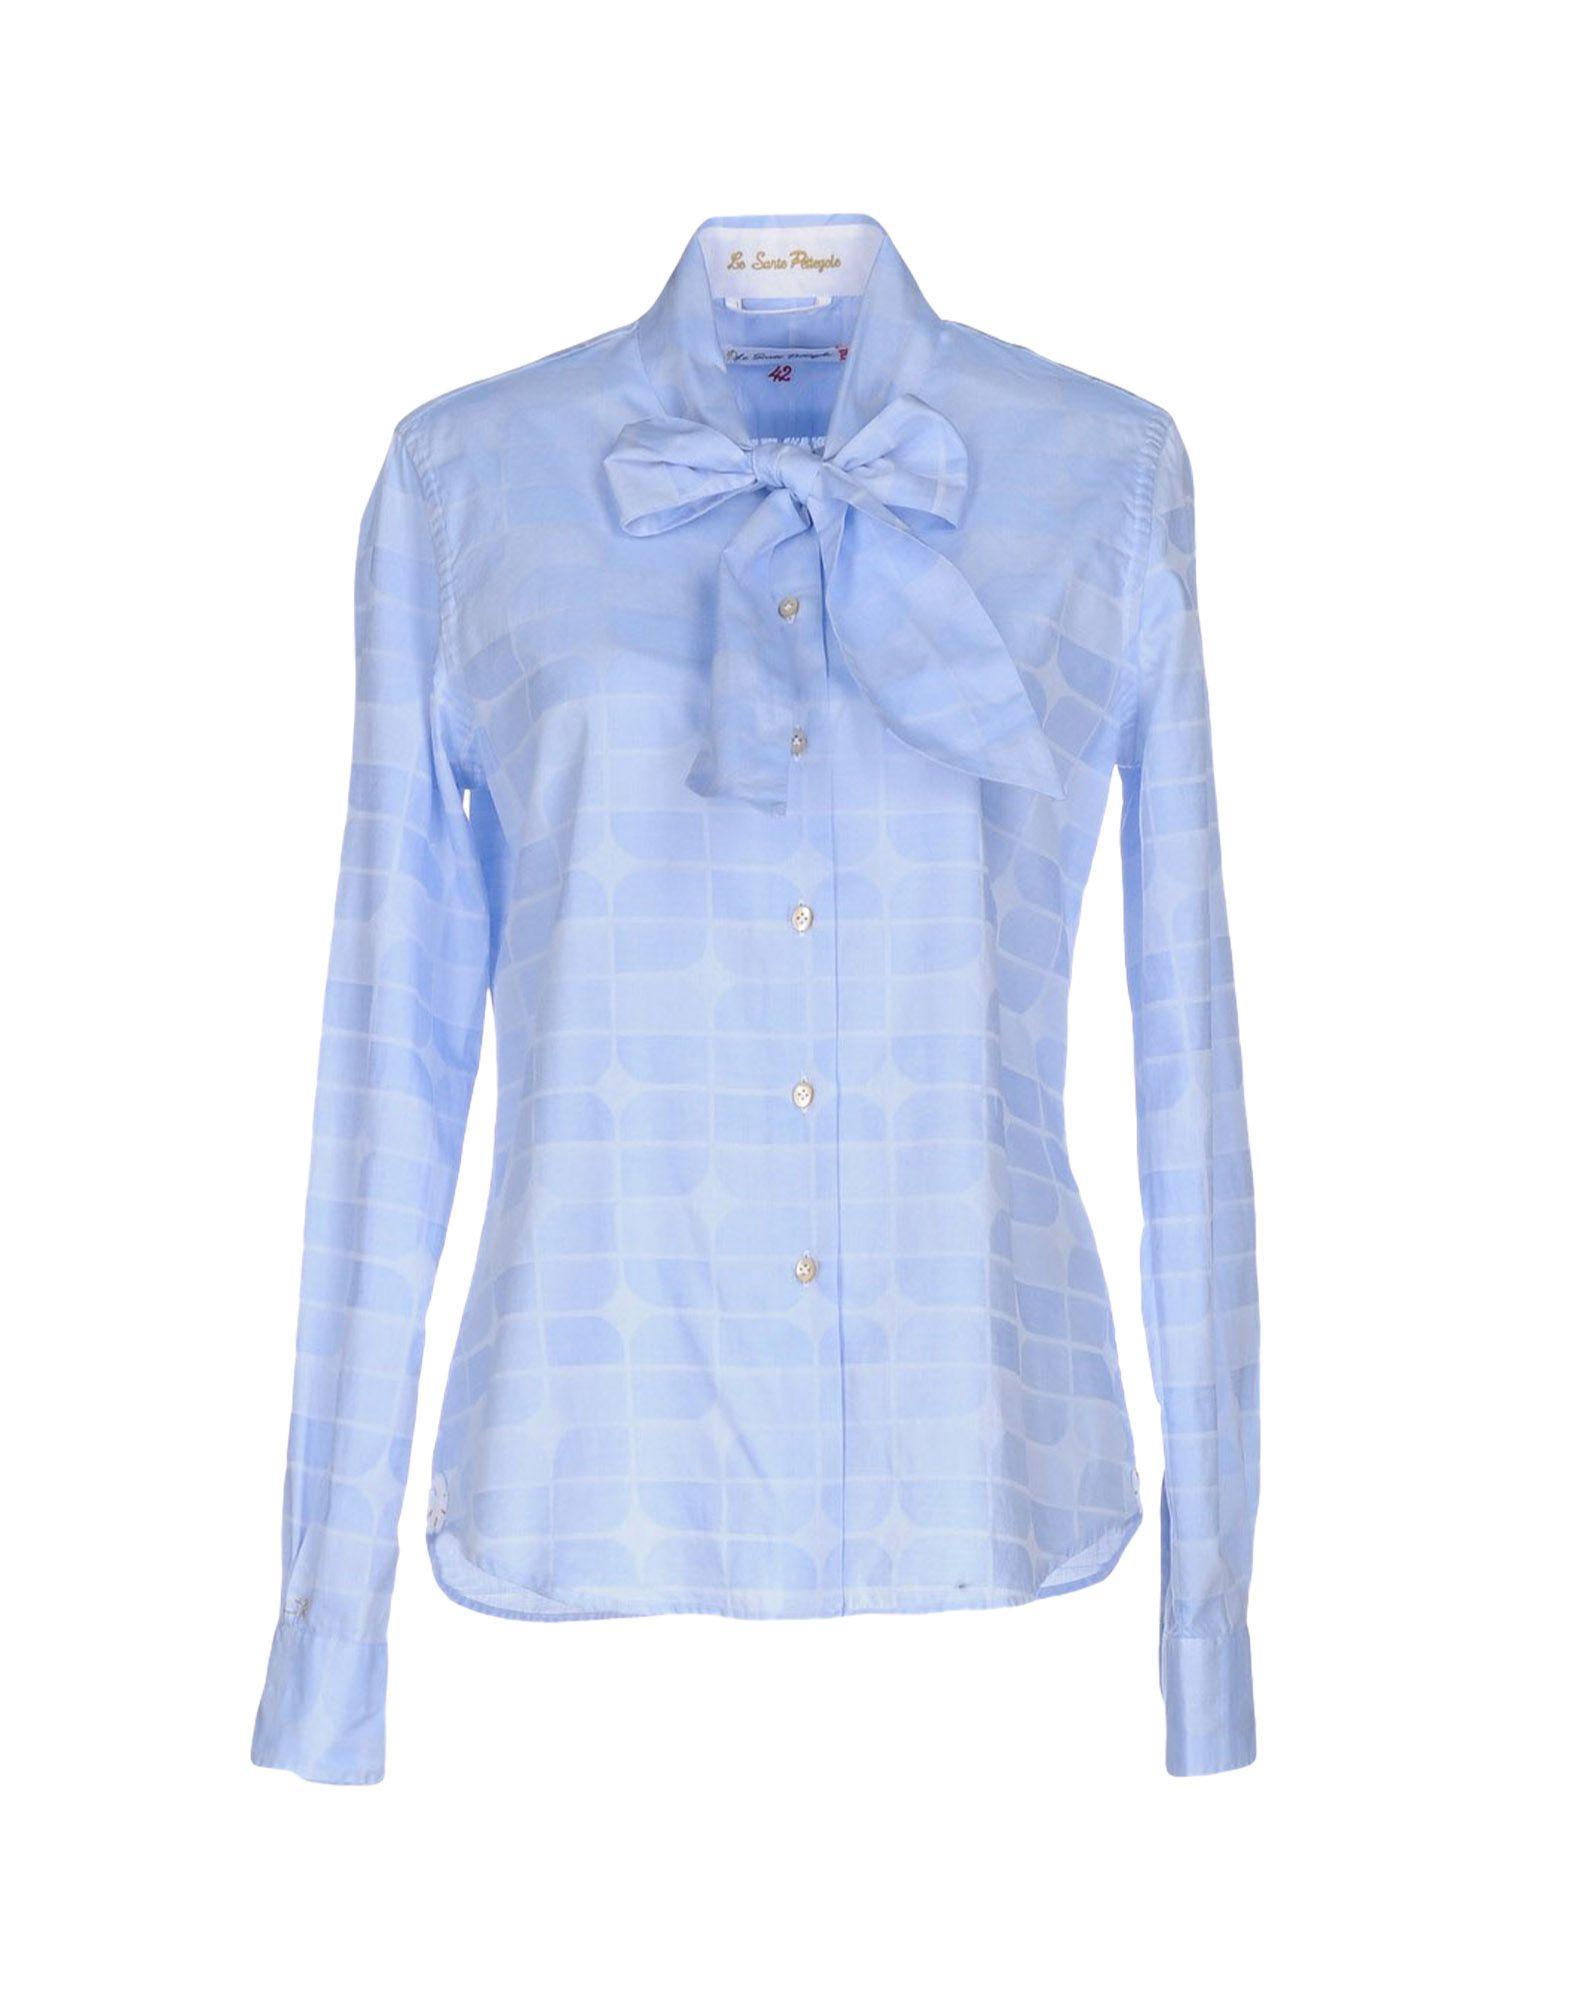 LE SARTE PETTEGOLE Damen Hemd Farbe Himmelblau Größe 4